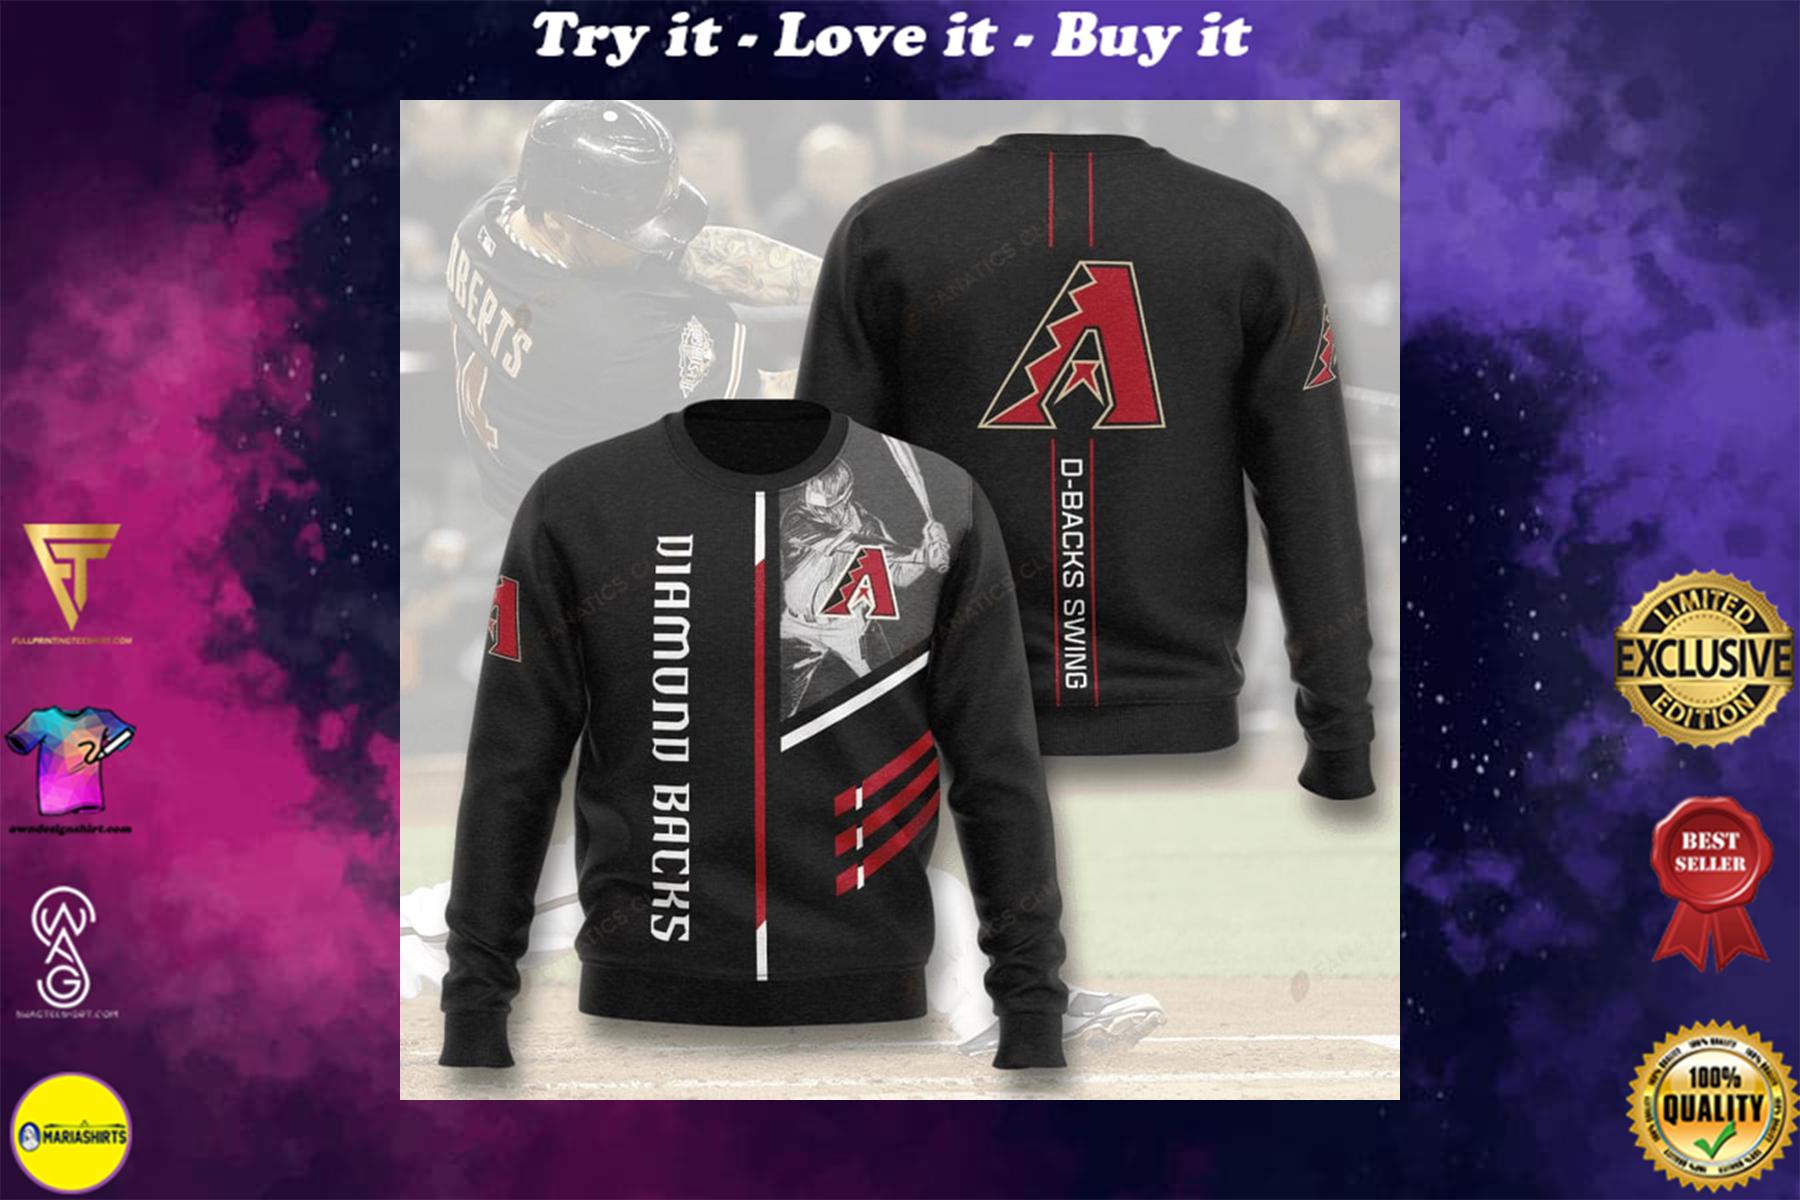 [highest selling] arizona diamondbacks d-backs swing full printing ugly sweater - maria